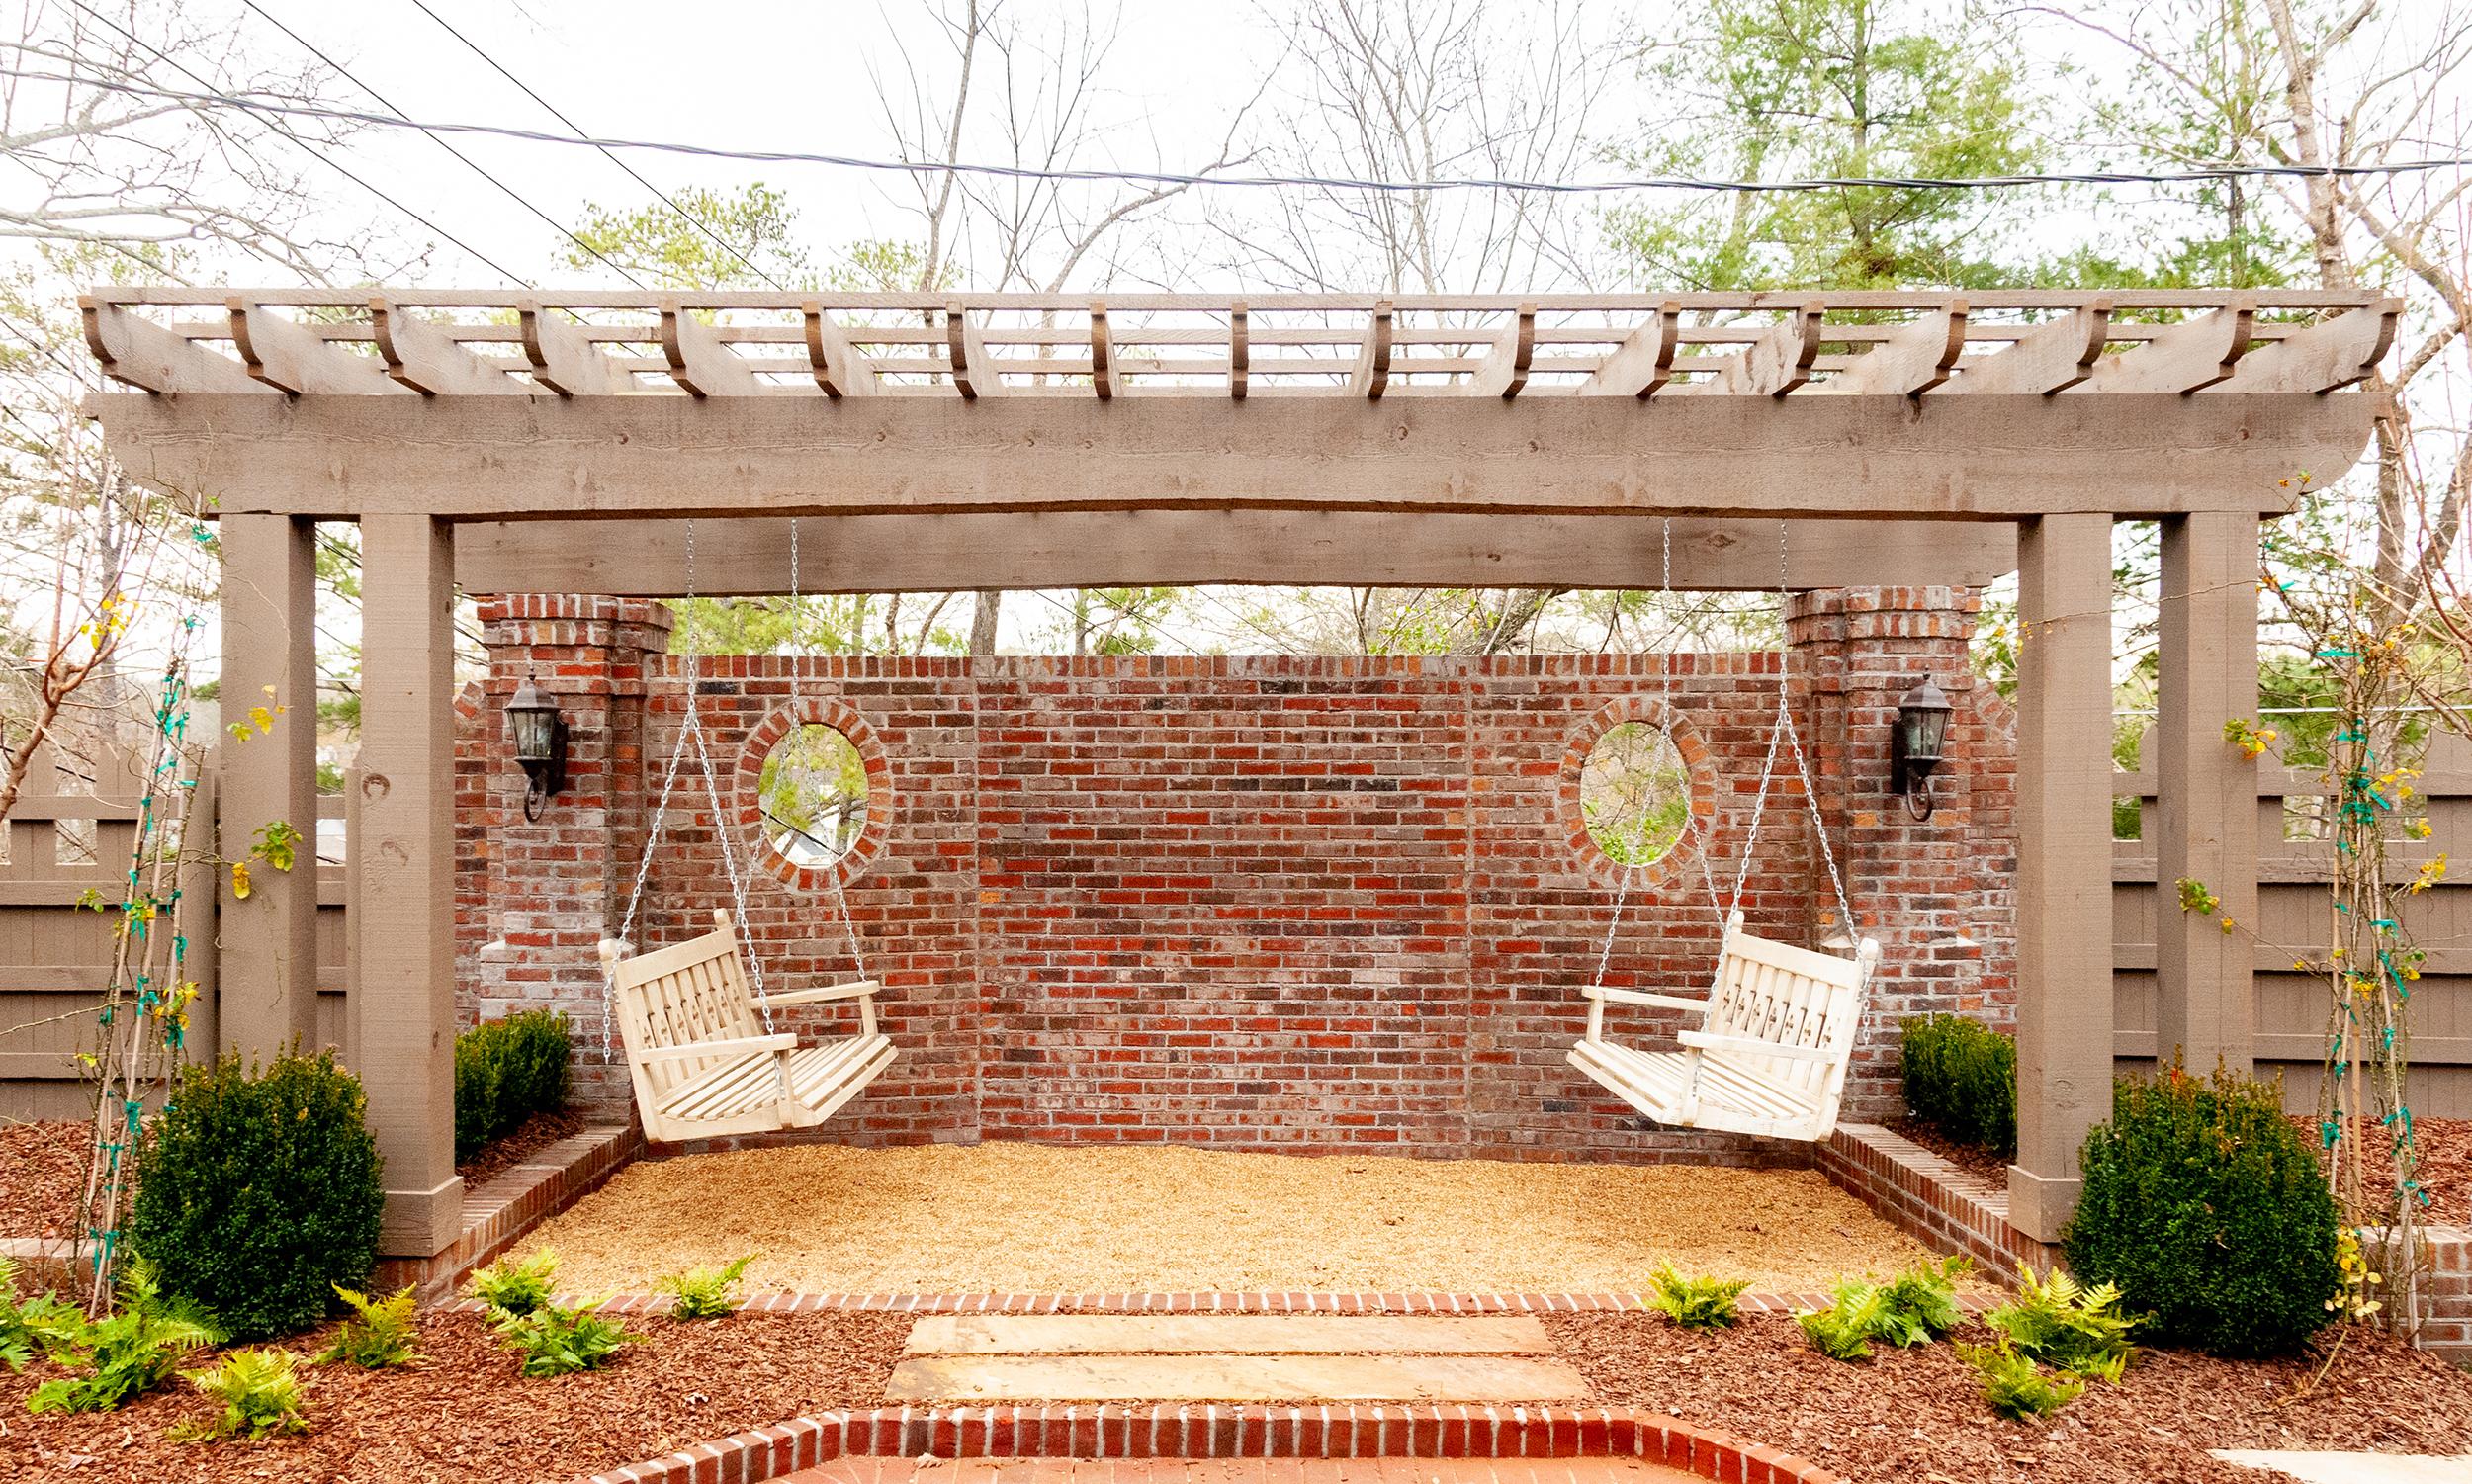 courtyard_garden_07_arbor_trellis_stockade_fence_stone_pea_gravel_path_2500.jpg